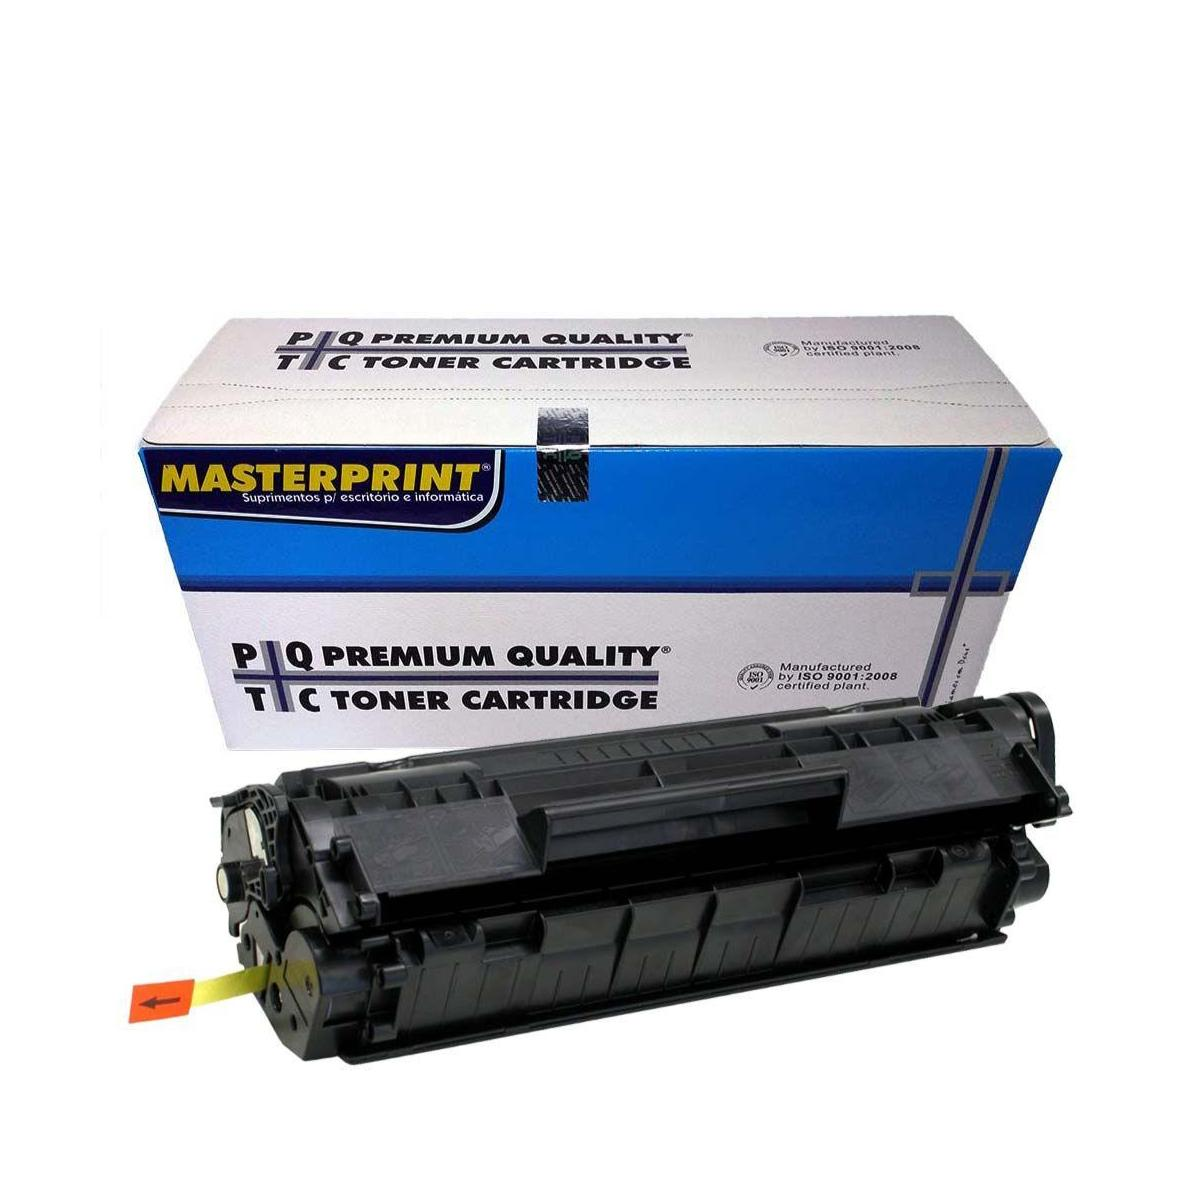 Toner HP  Universal CB 435/ CB 436/ CE 285/ CE 278 Compatível Masterprint